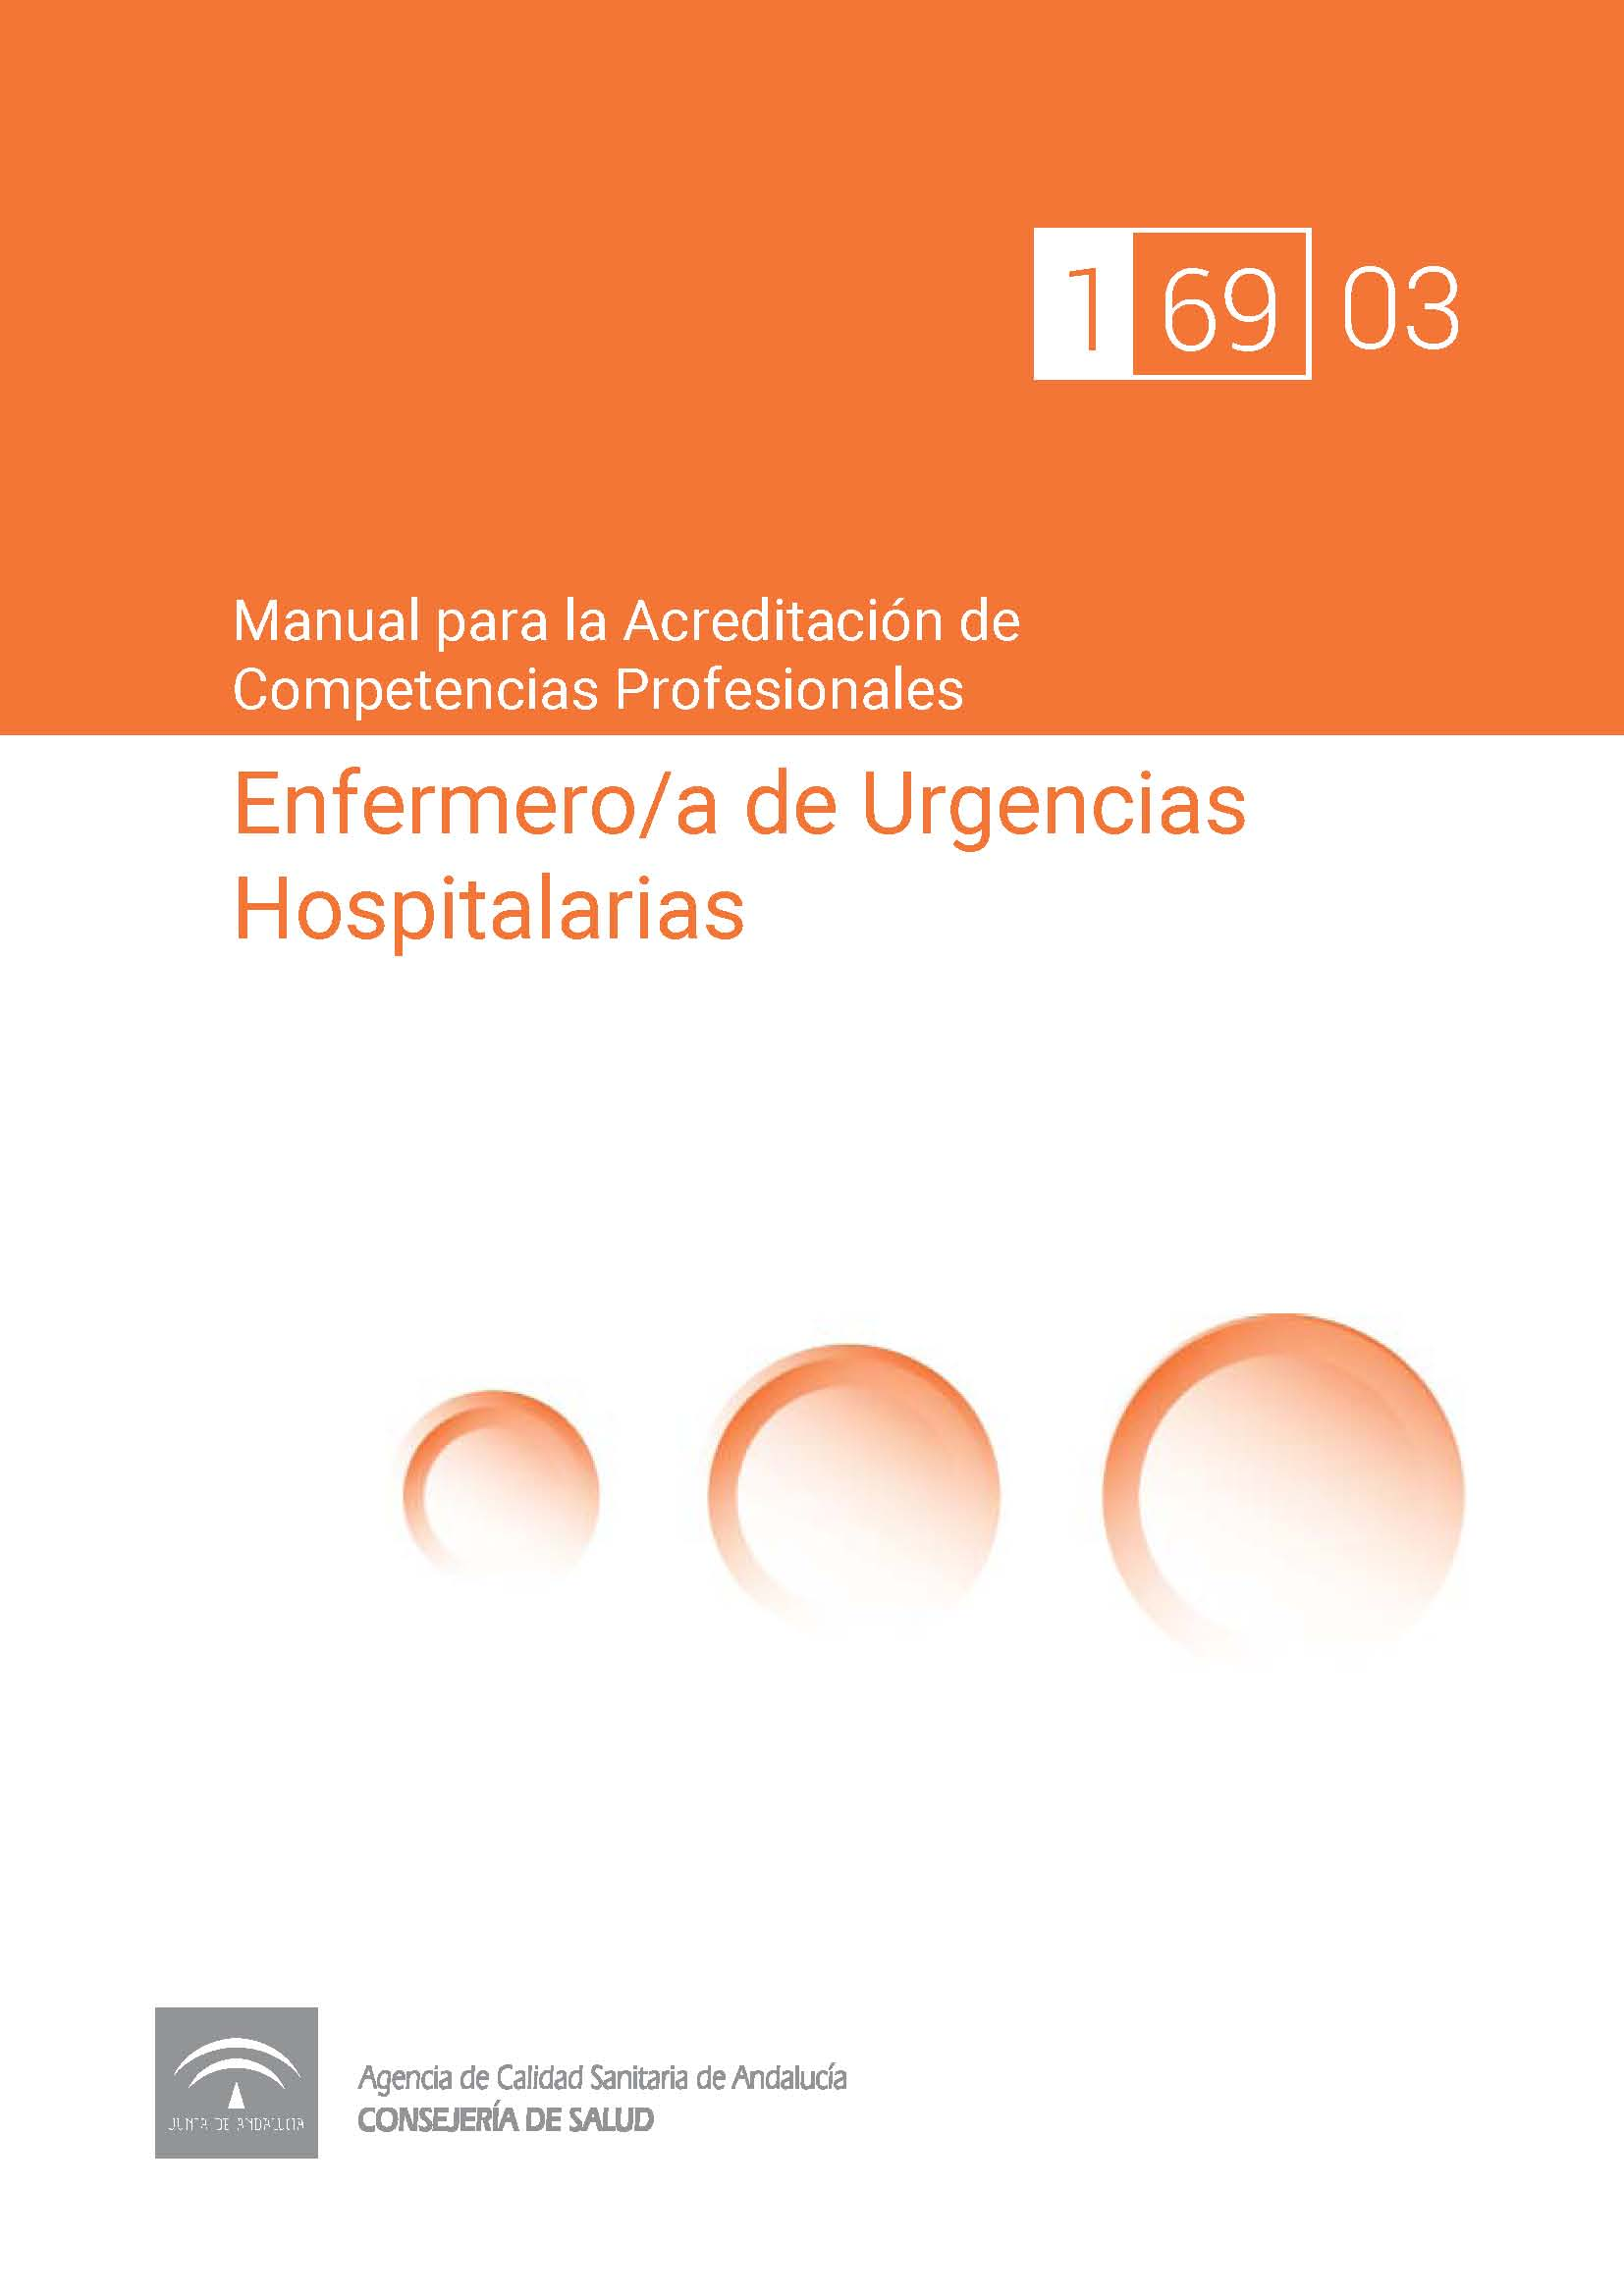 Enfermero/a de Urgencias Hospitalarias